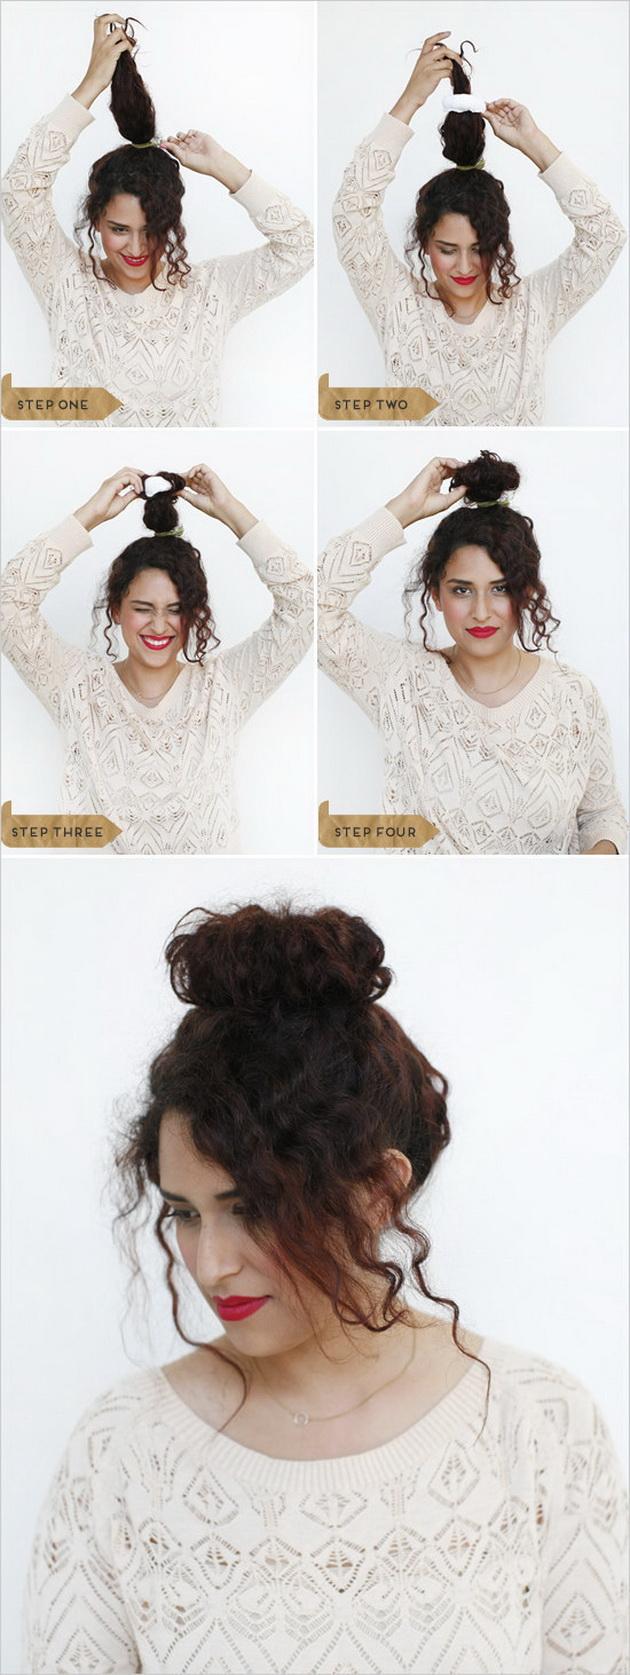 12-frizuri-za-devojkite-so-prirodno-vitkana-kosa-gotovi-za-5-minuti-4.jpg